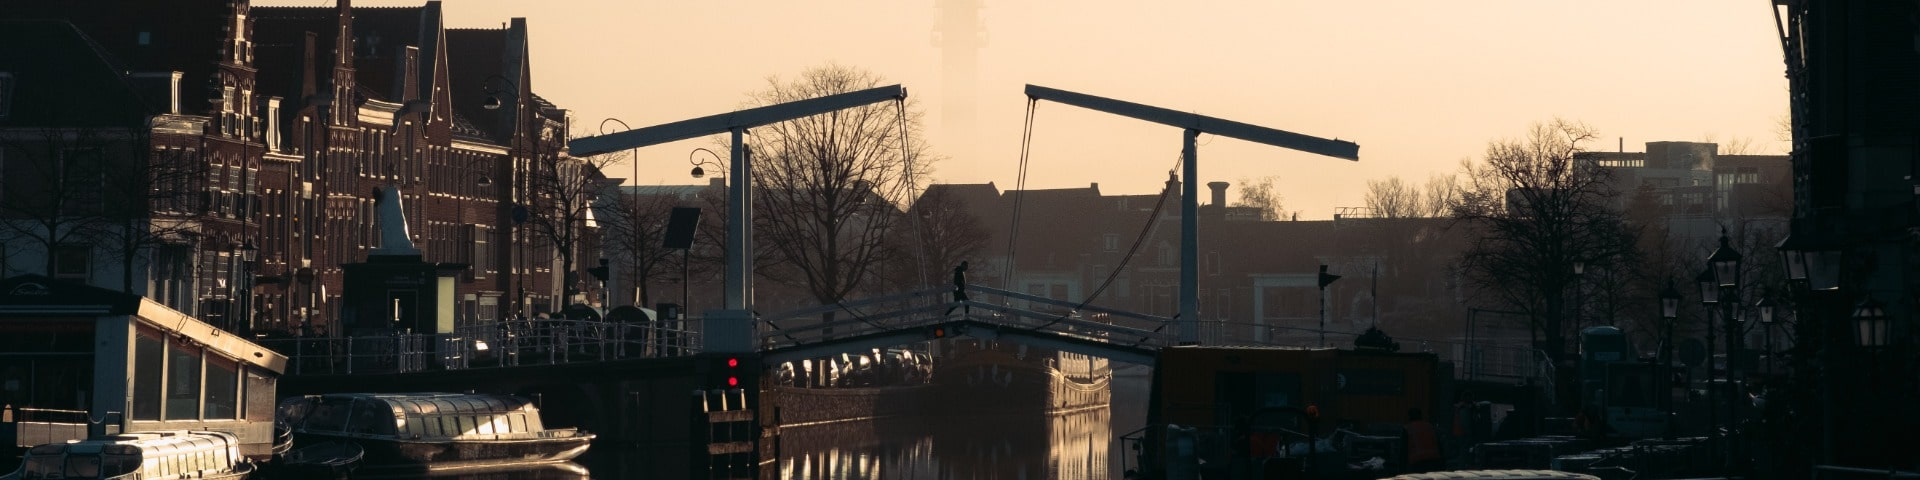 bridge across canal in Haarlem